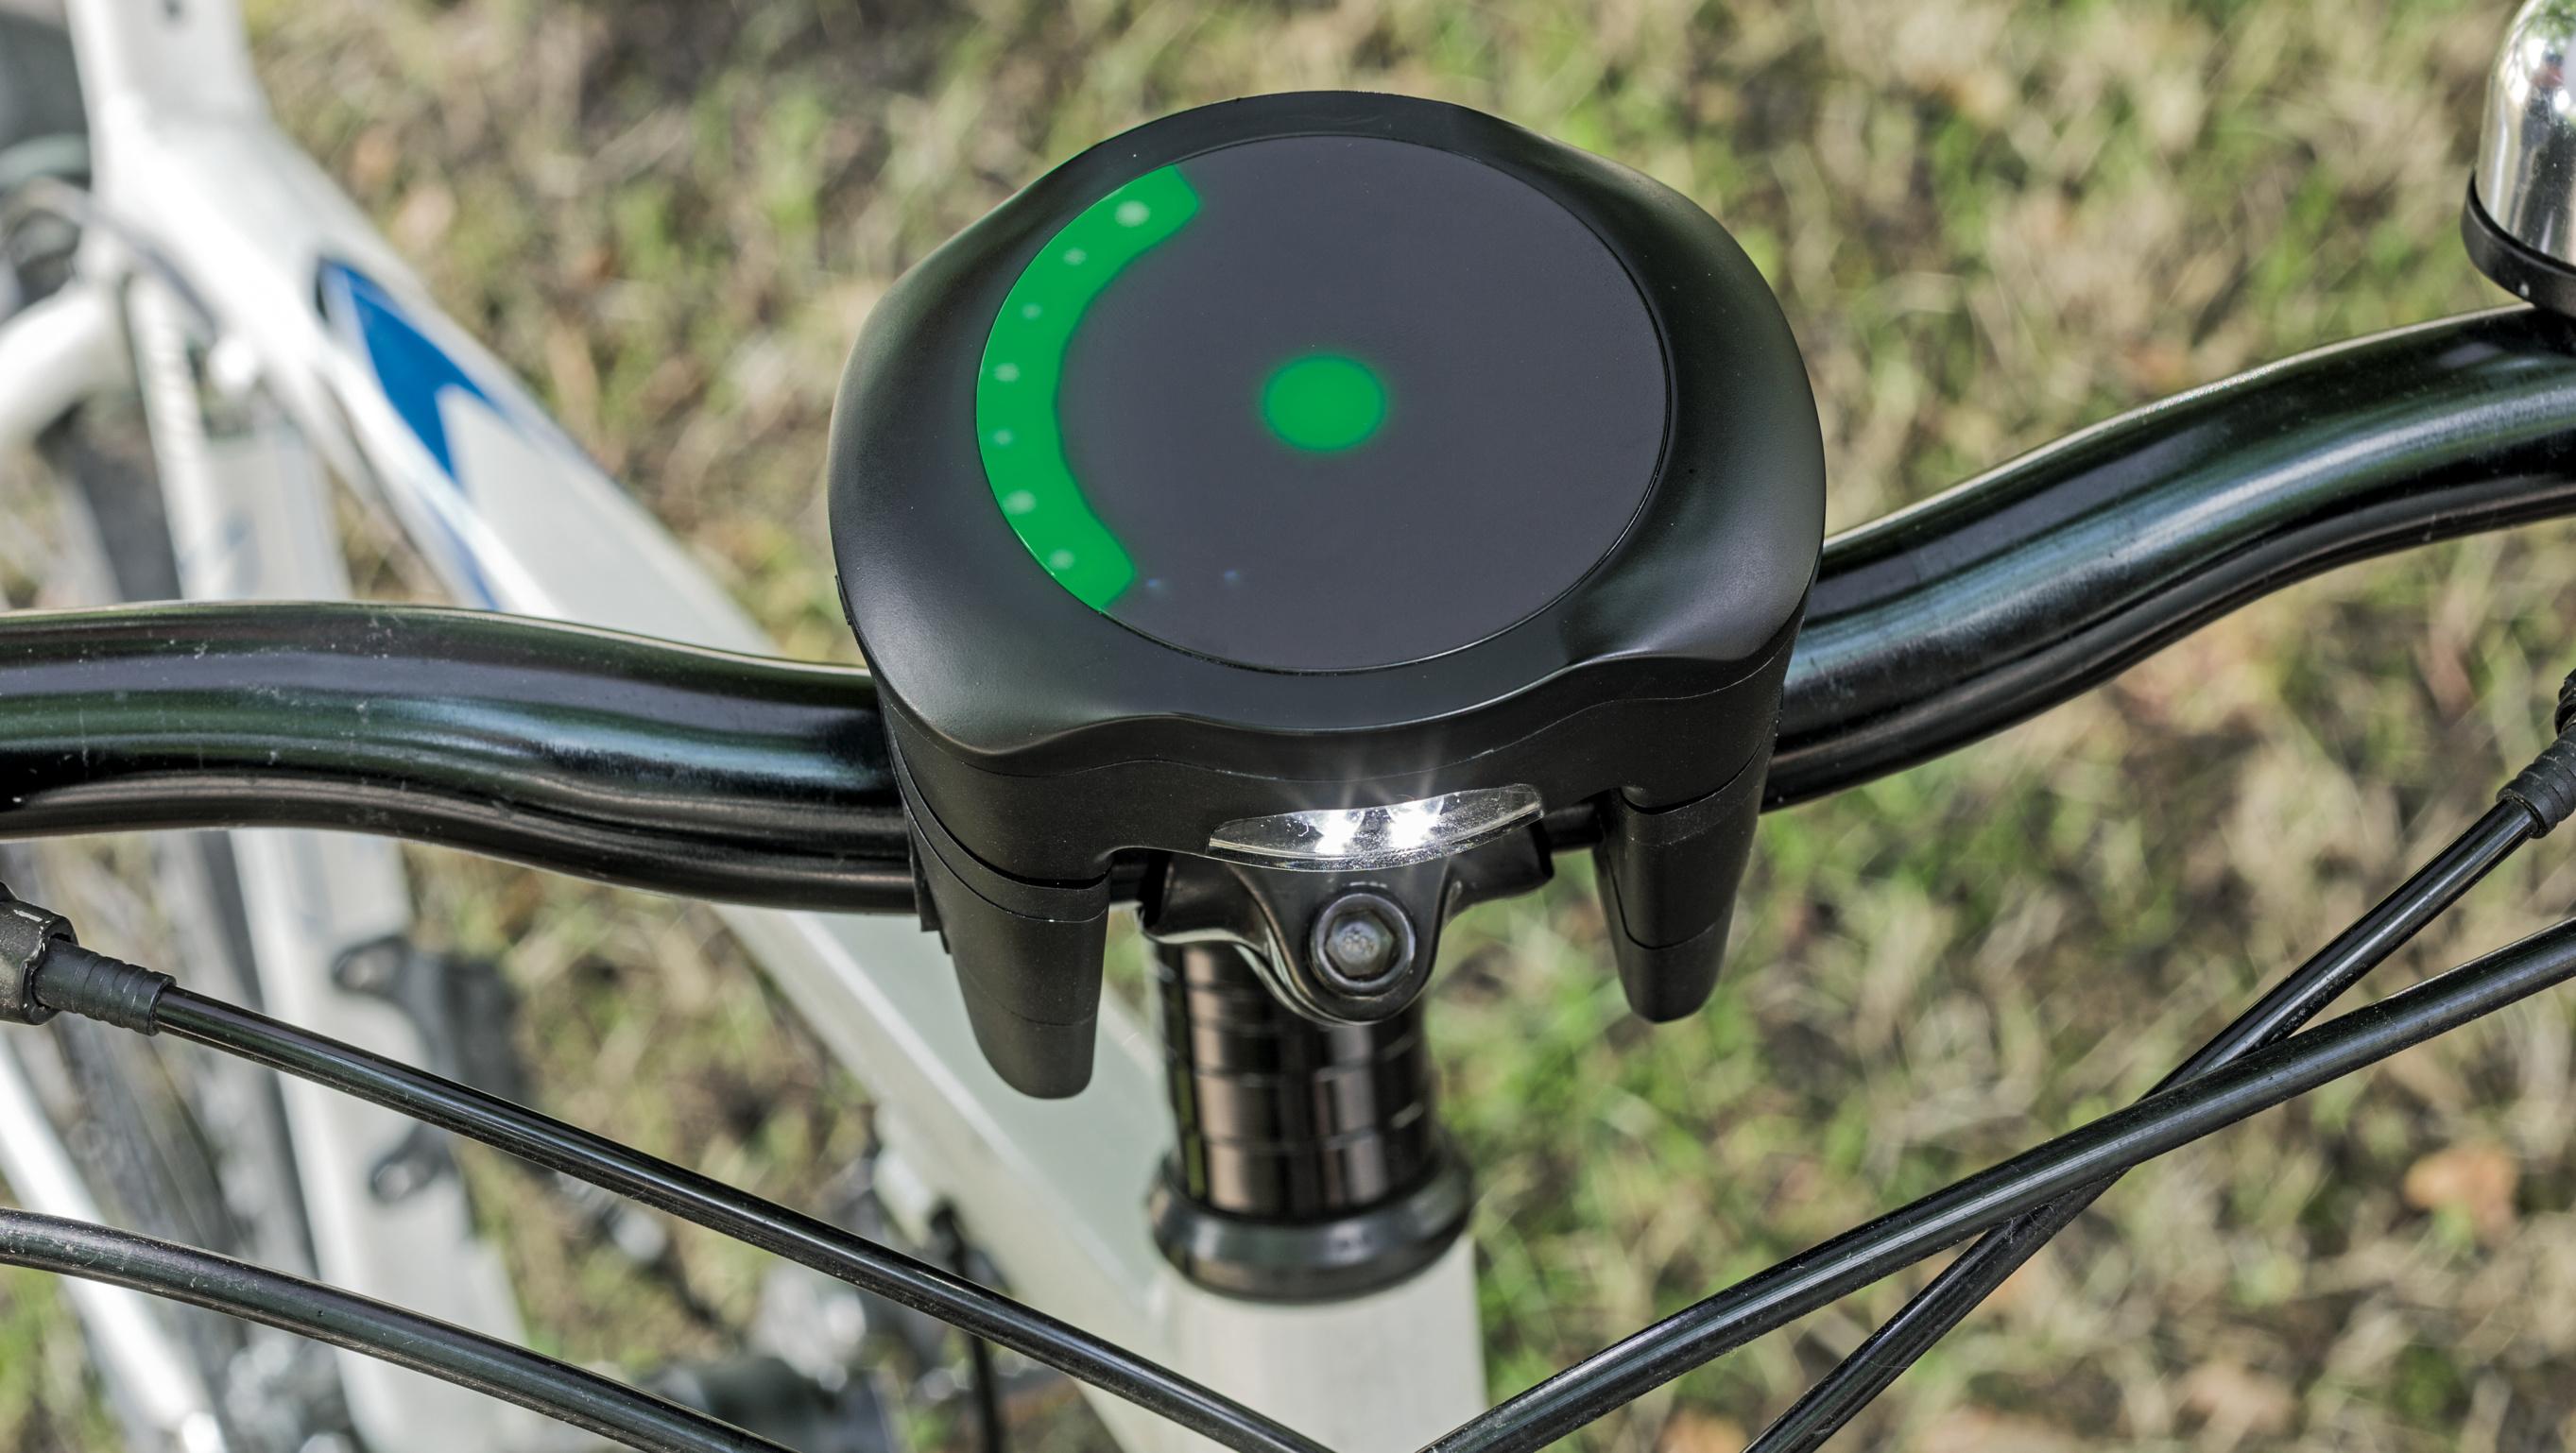 Licht Alarm Auto : Richtungsweisender ring mac & i heise select